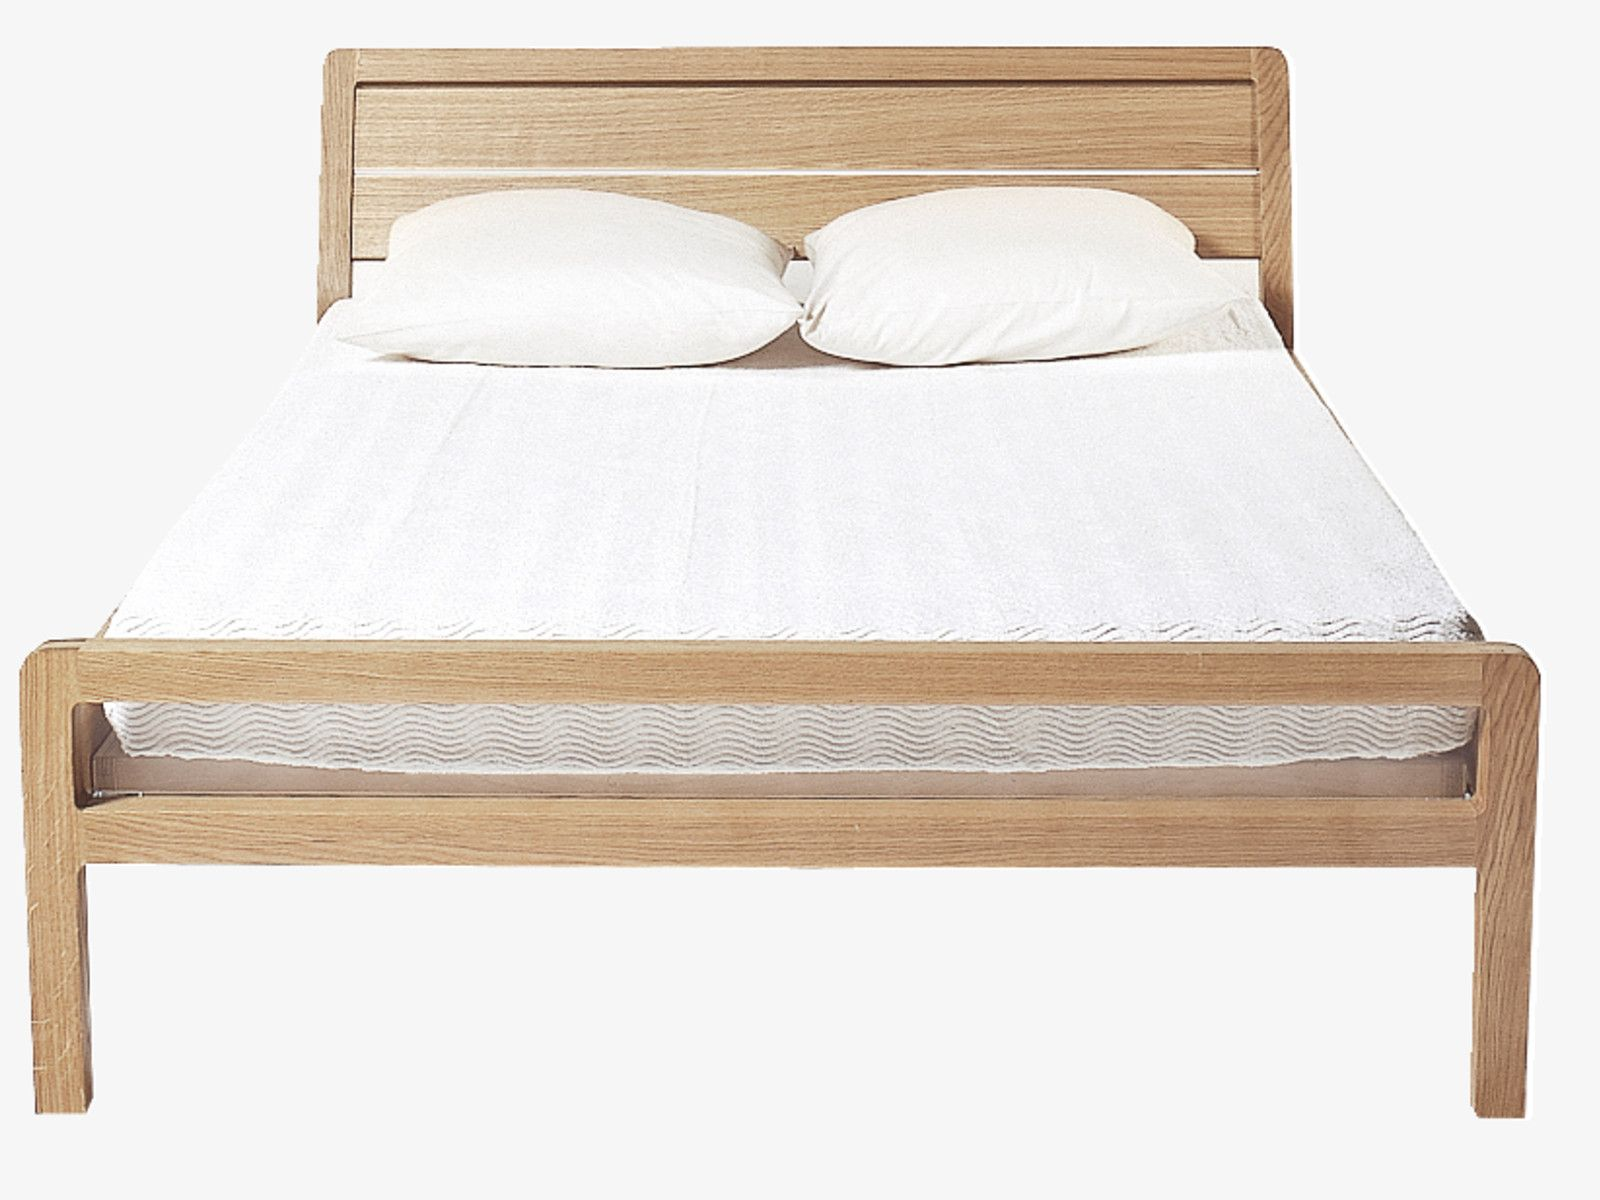 RADUS Holz Doppelbett, groß - Betten und Matratzen - Habitat | Bett ...